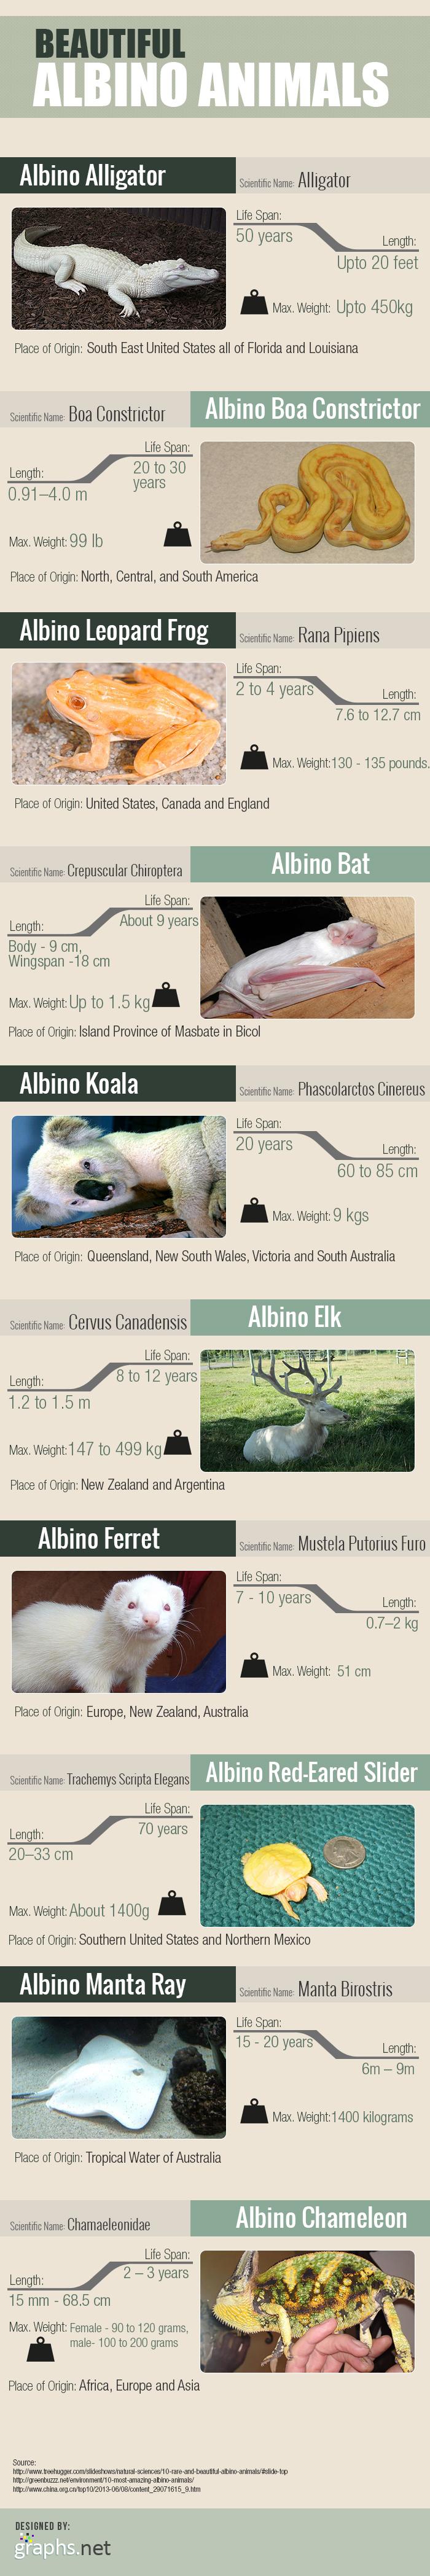 Top-10-Beautiful-Albino-Animals